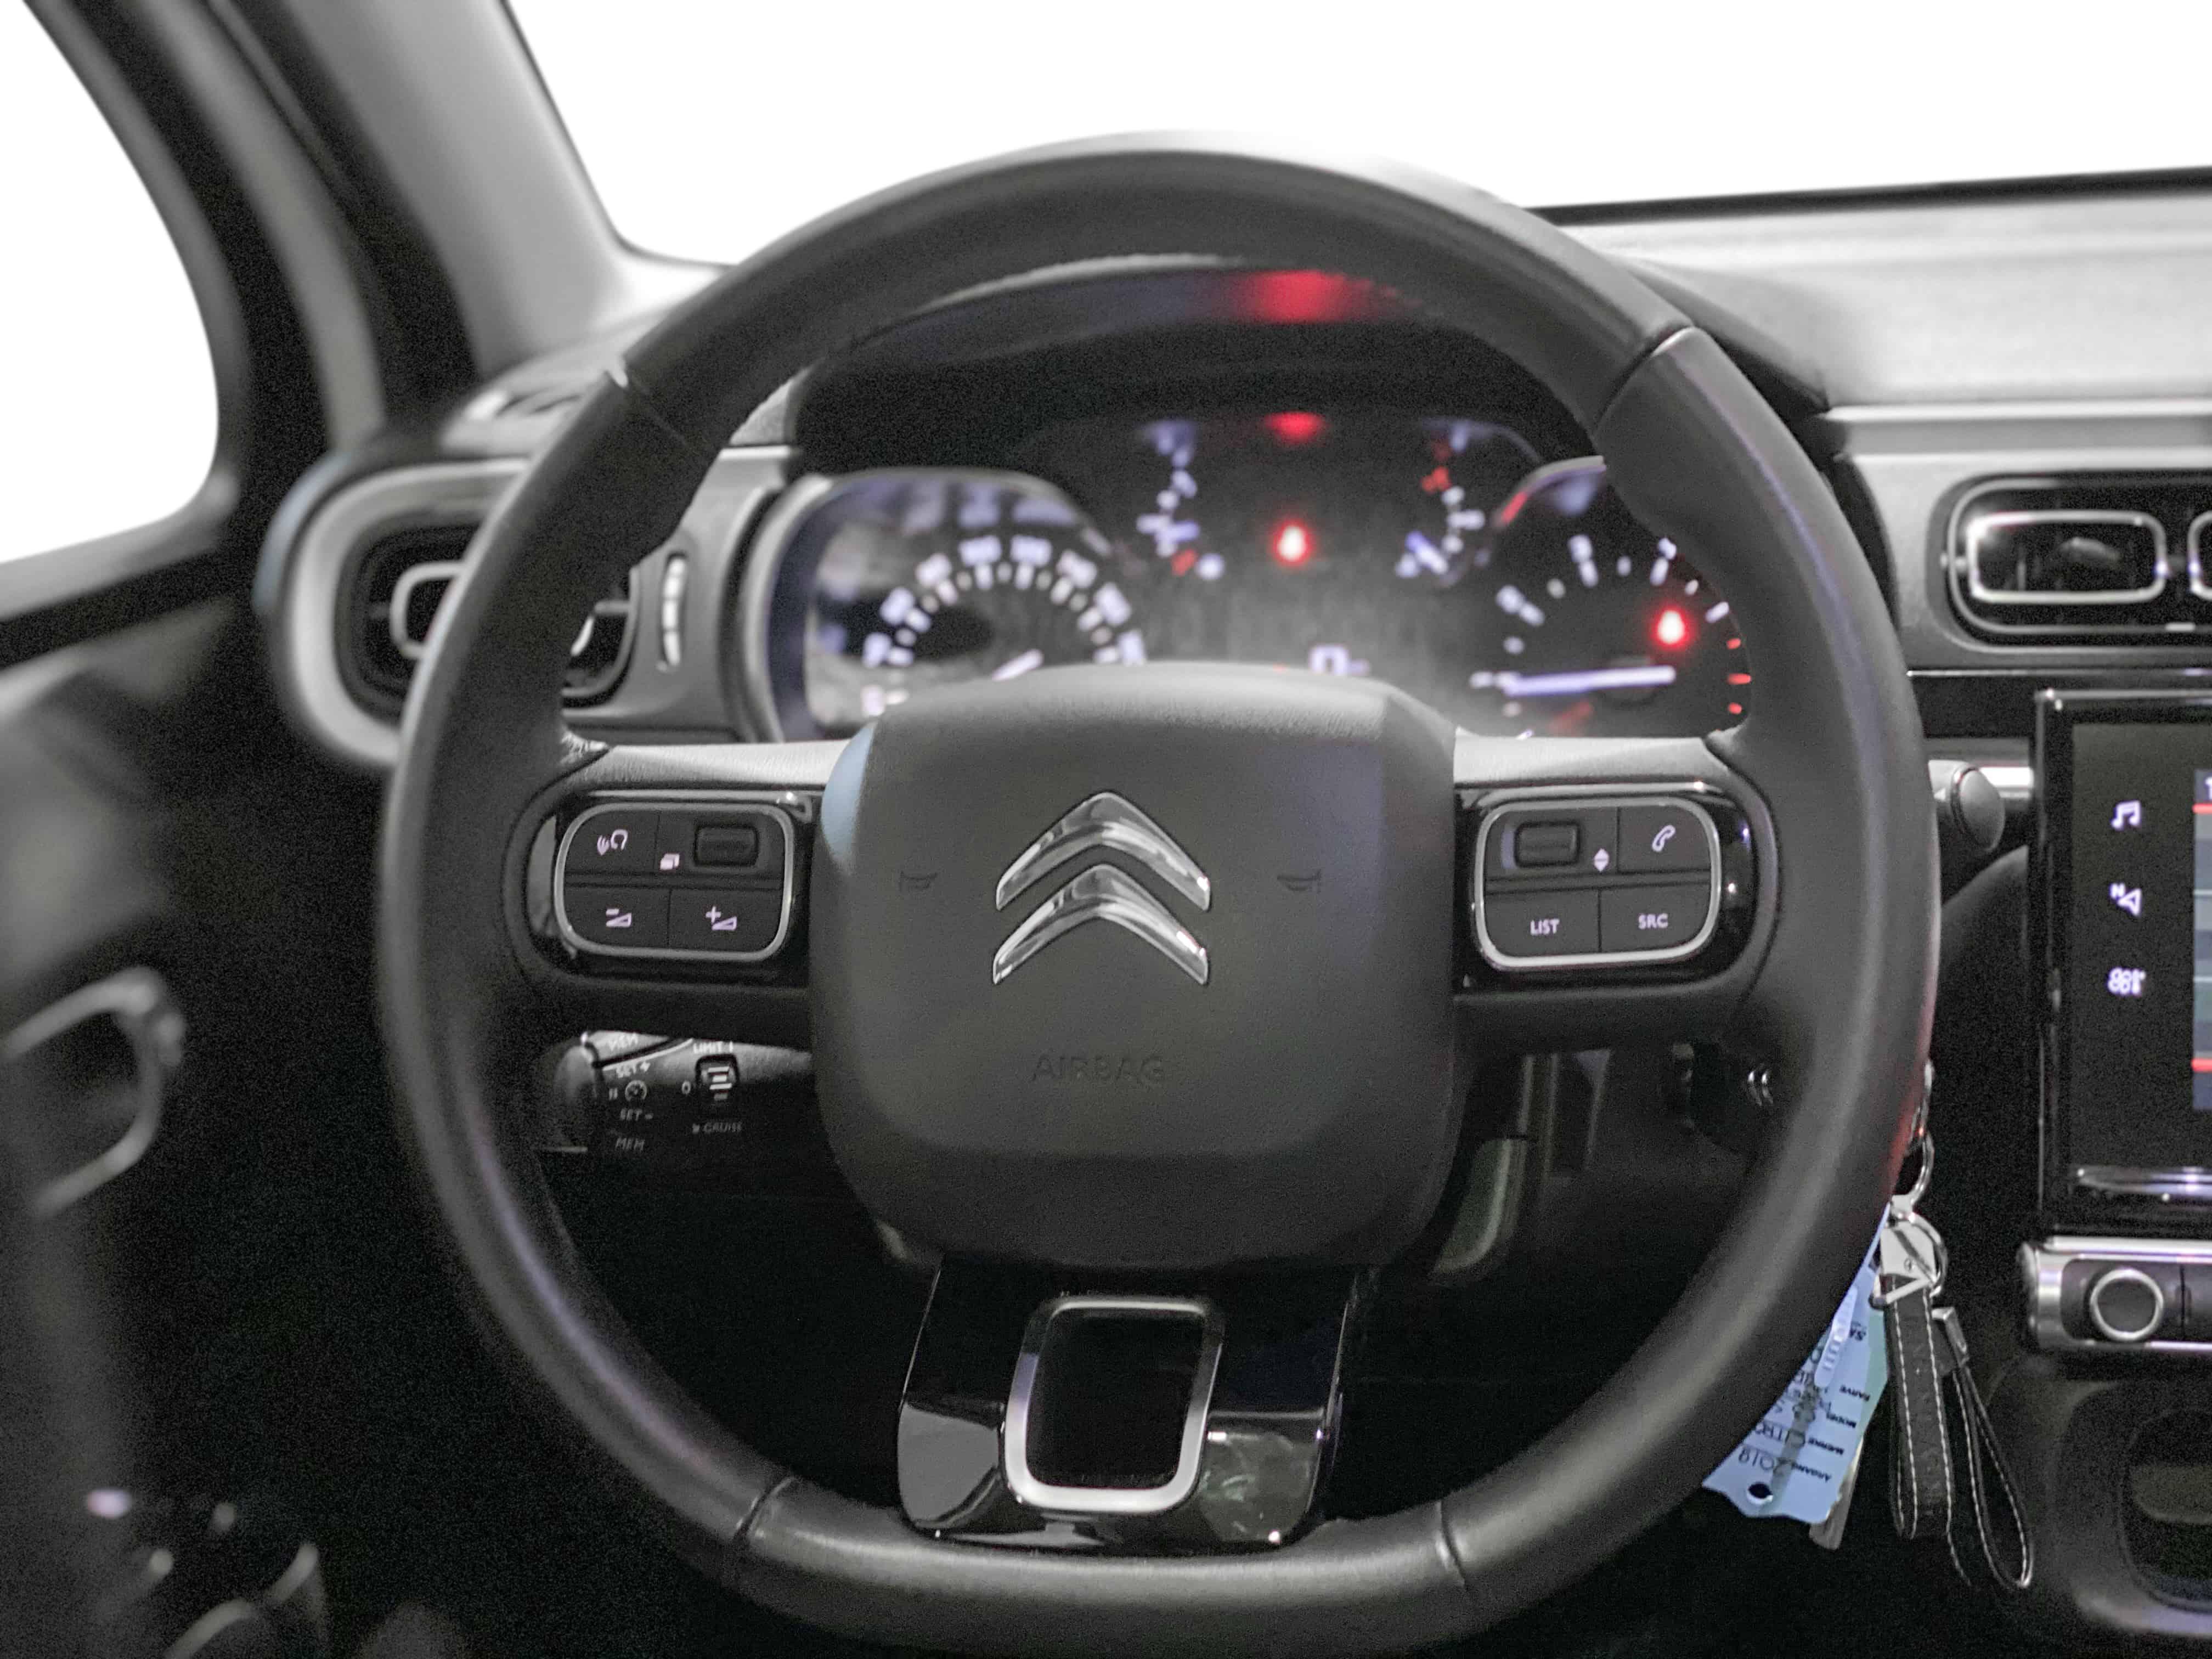 Citroën C3 1,2 82 VTR Sport 5d